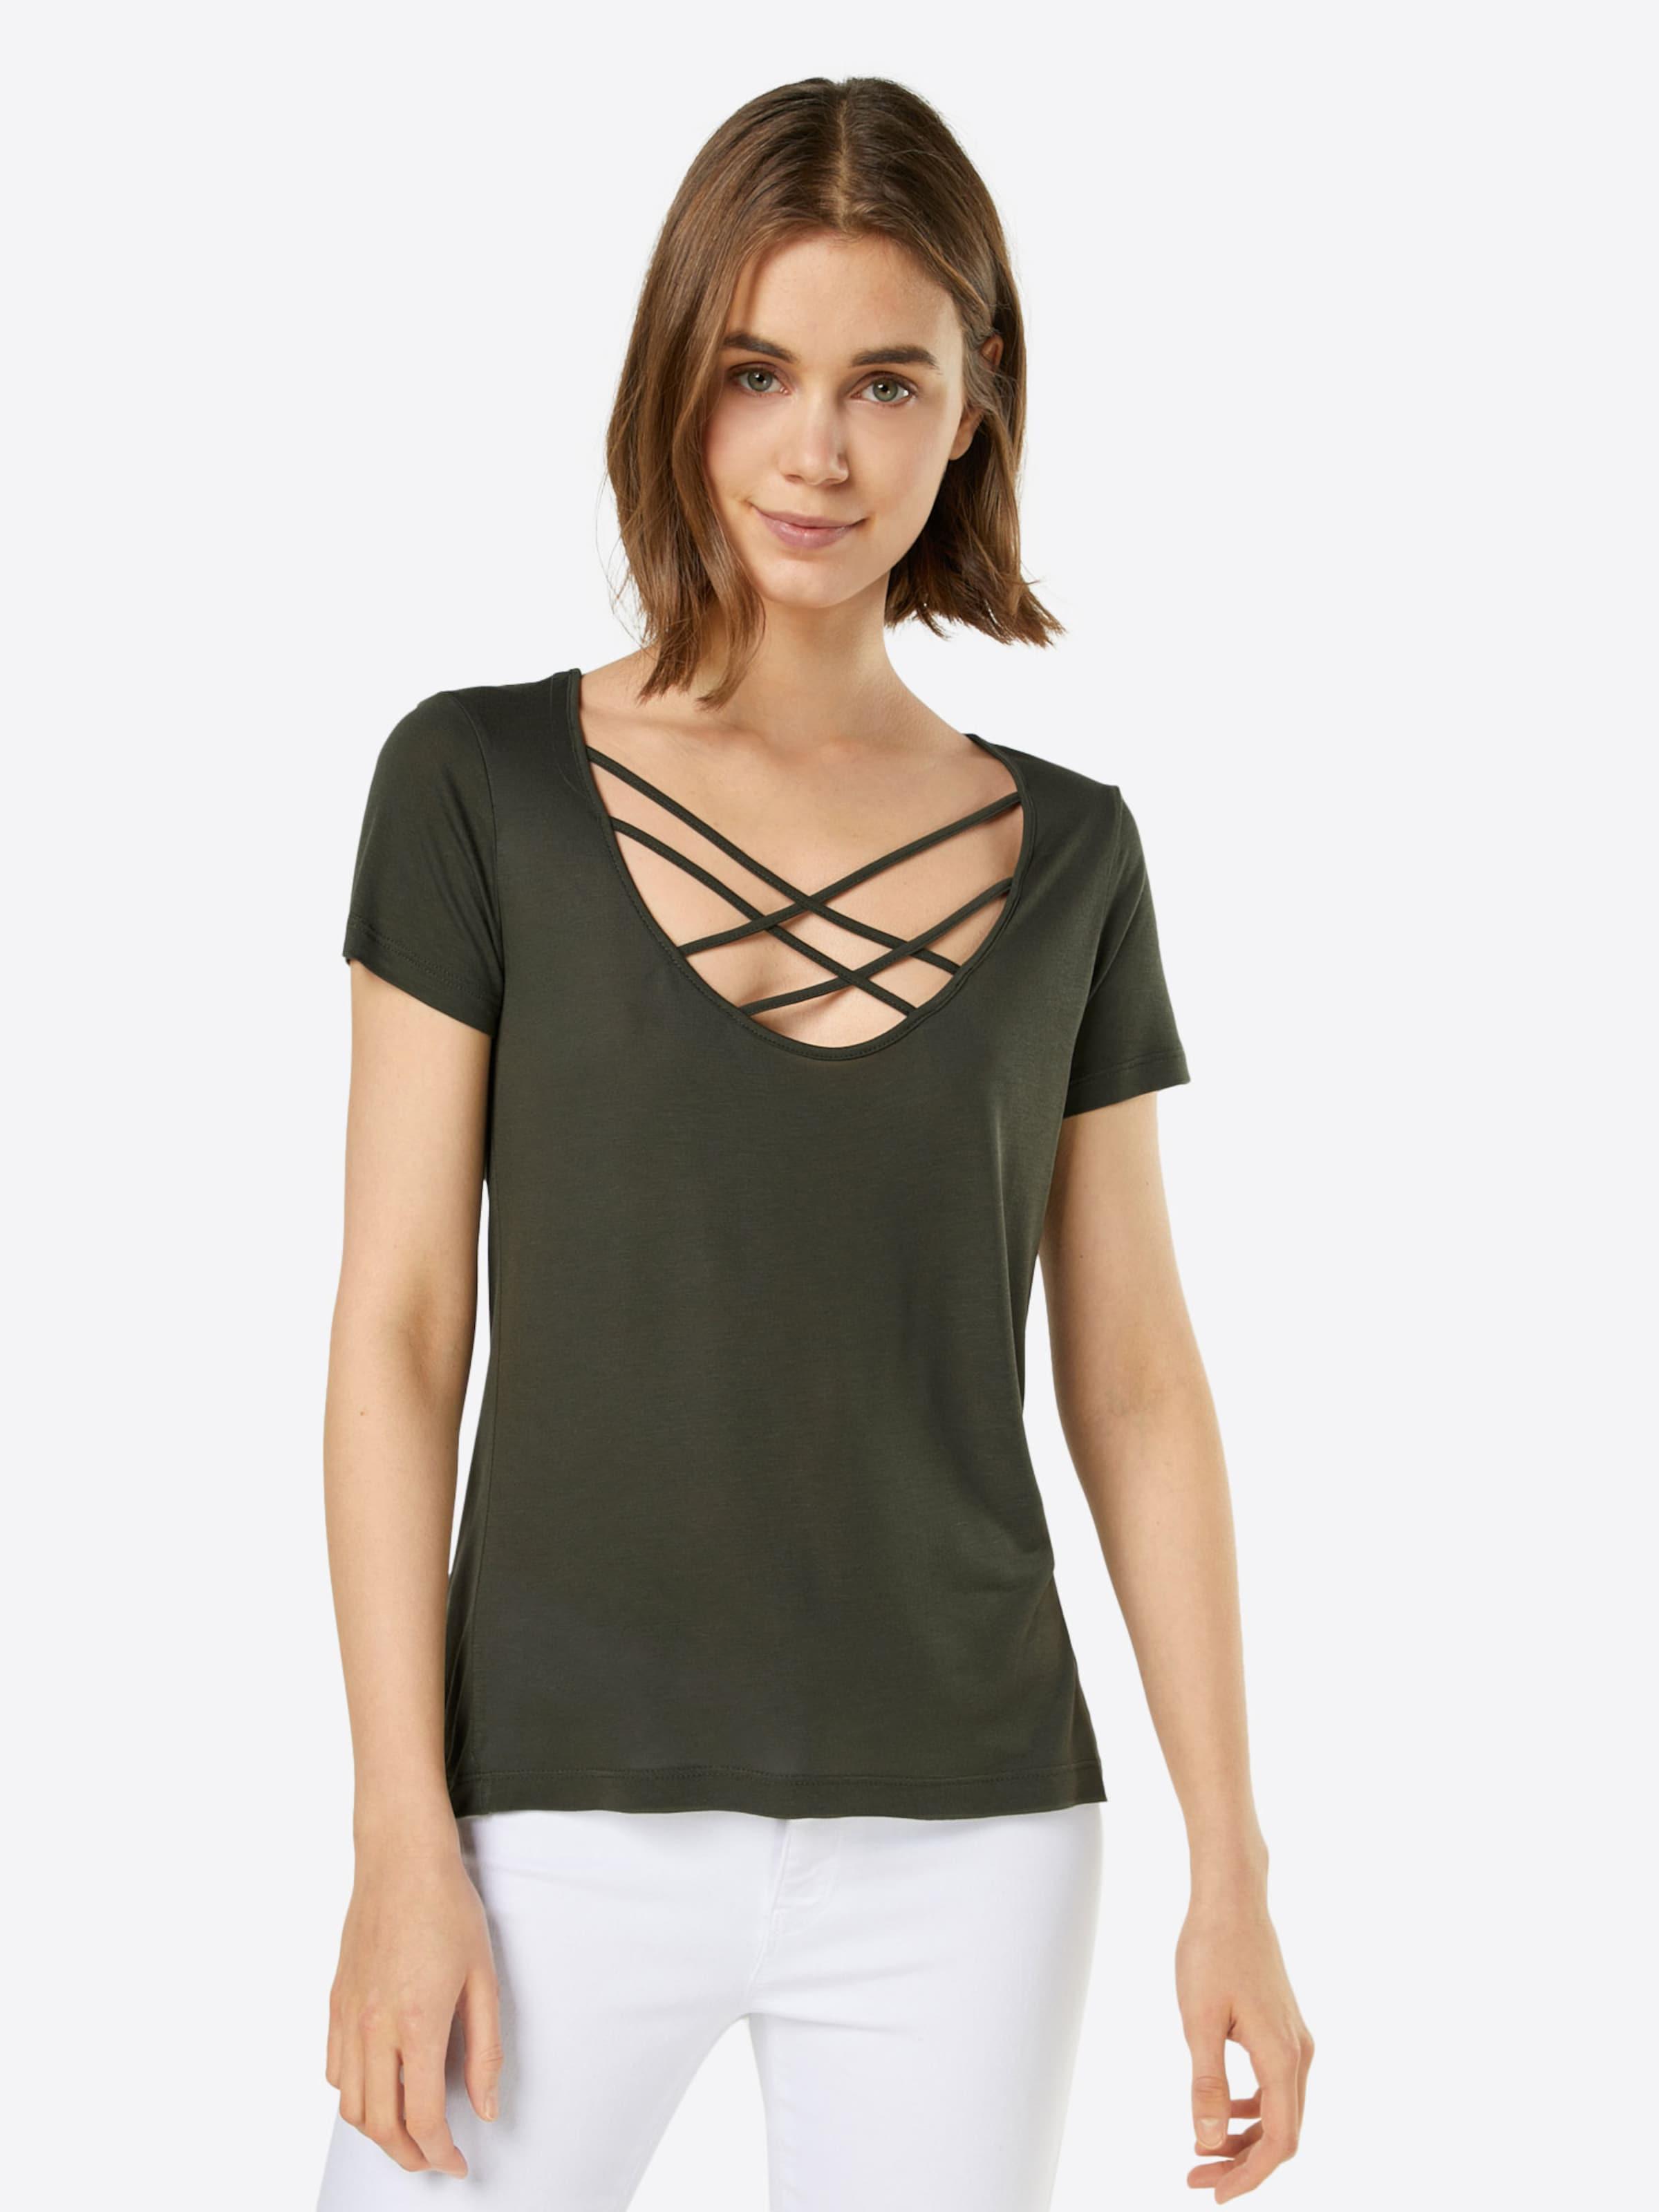 Rabatt Sehr Billig ABOUT YOU T-Shirt 'Levinia' Sneakernews Freier Versandauftrag 0x4fvwajO